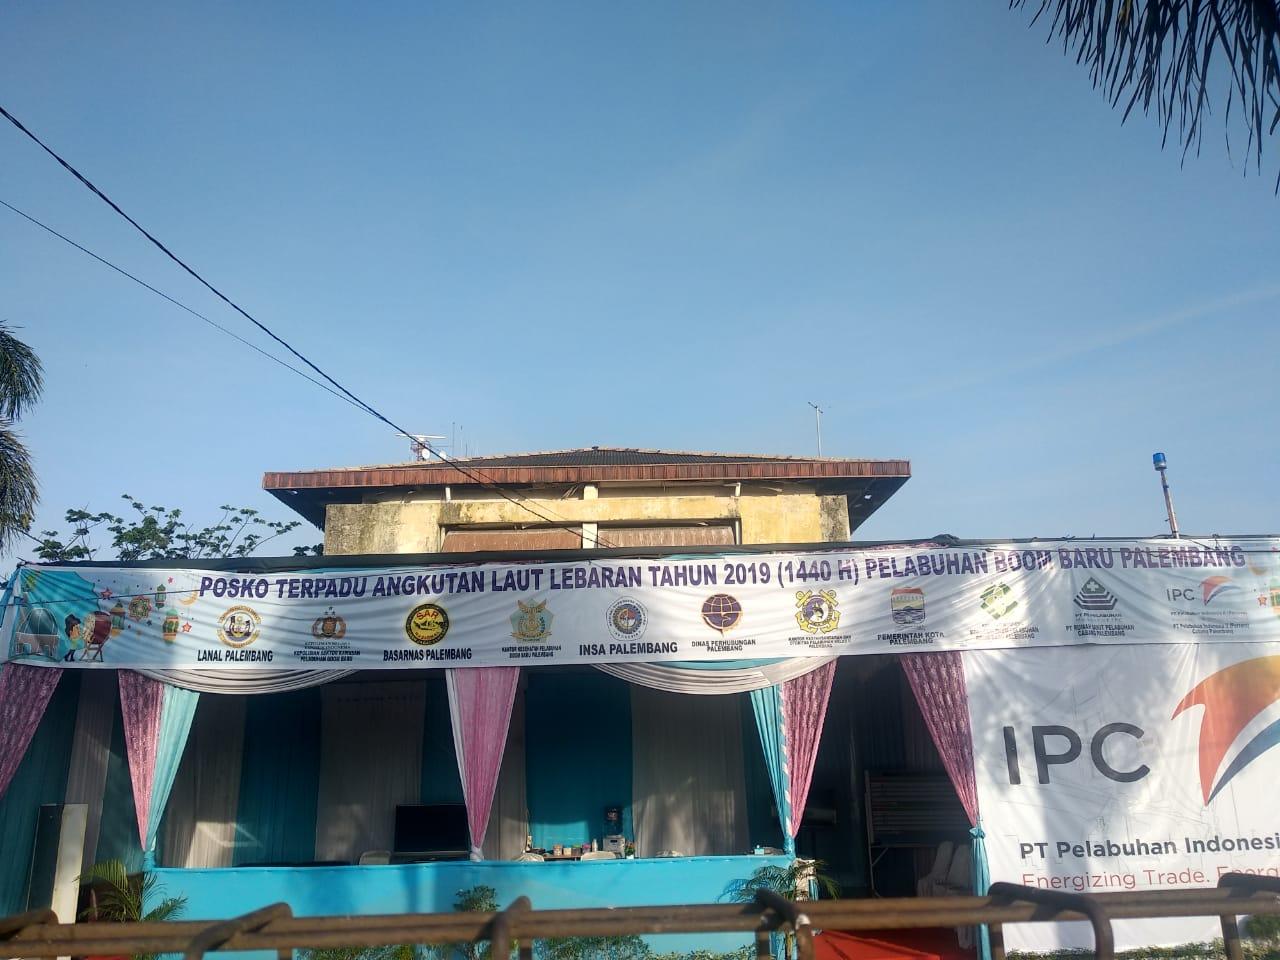 Posko Terpadu Arus Mudik di Pelabuhan Boom Baru Palembang Tahun 2019